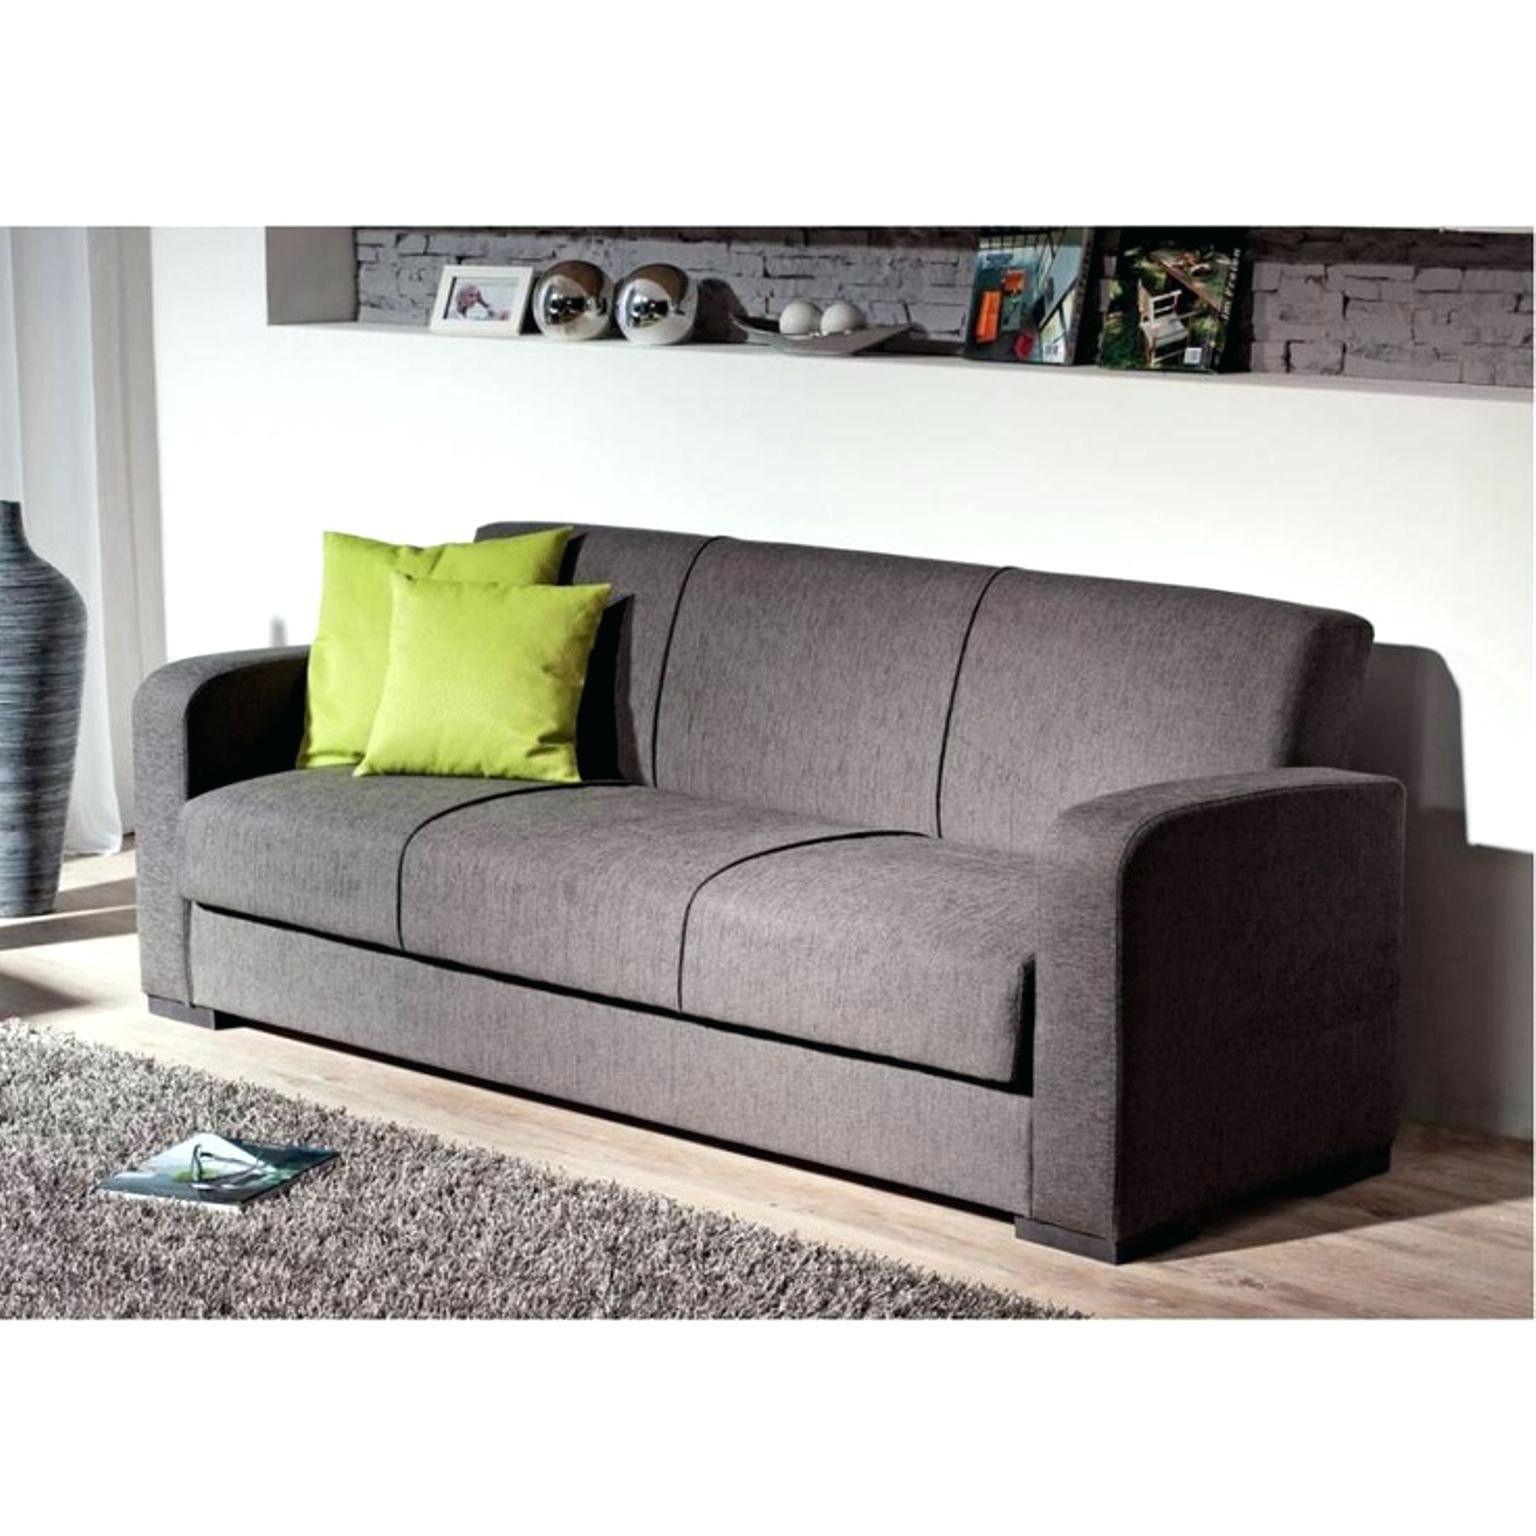 Schlafsofa Zum Ausziehen New Sessel Zum Ausziehen Elegant Sessel Bezug Ikea Sessel Di 2020